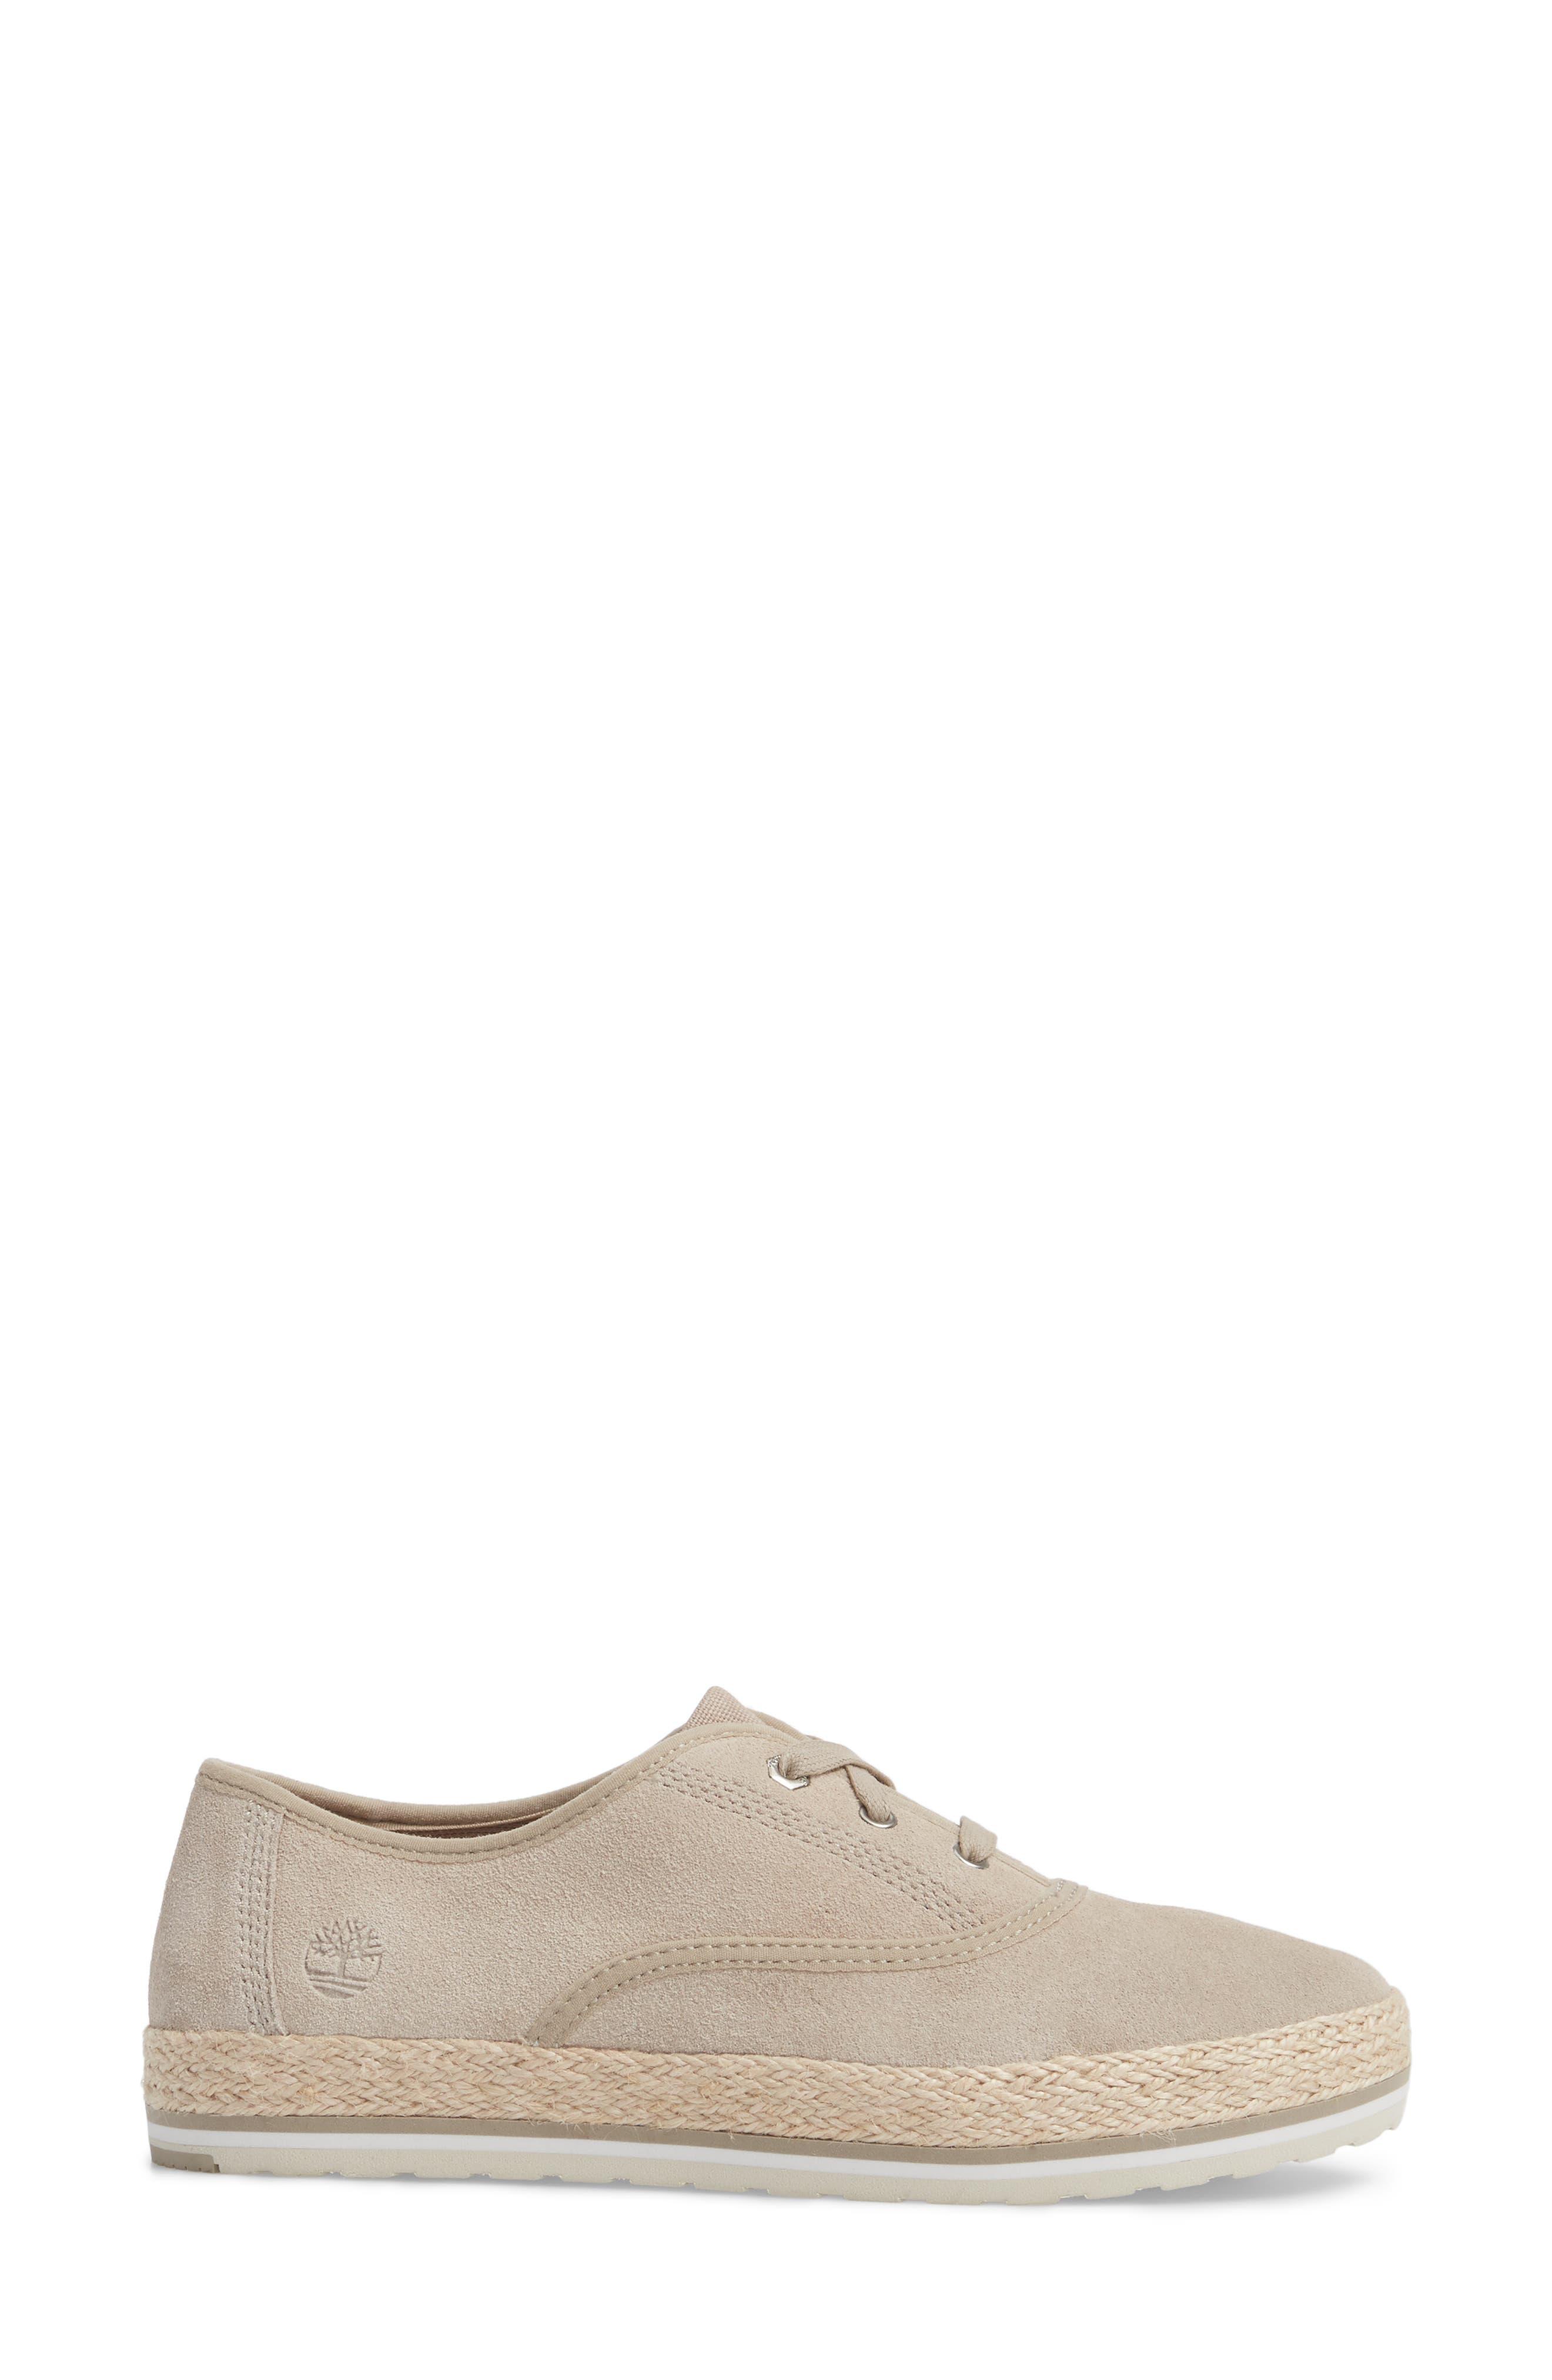 Eivissa Sea Oxford Sneaker,                             Alternate thumbnail 3, color,                             270